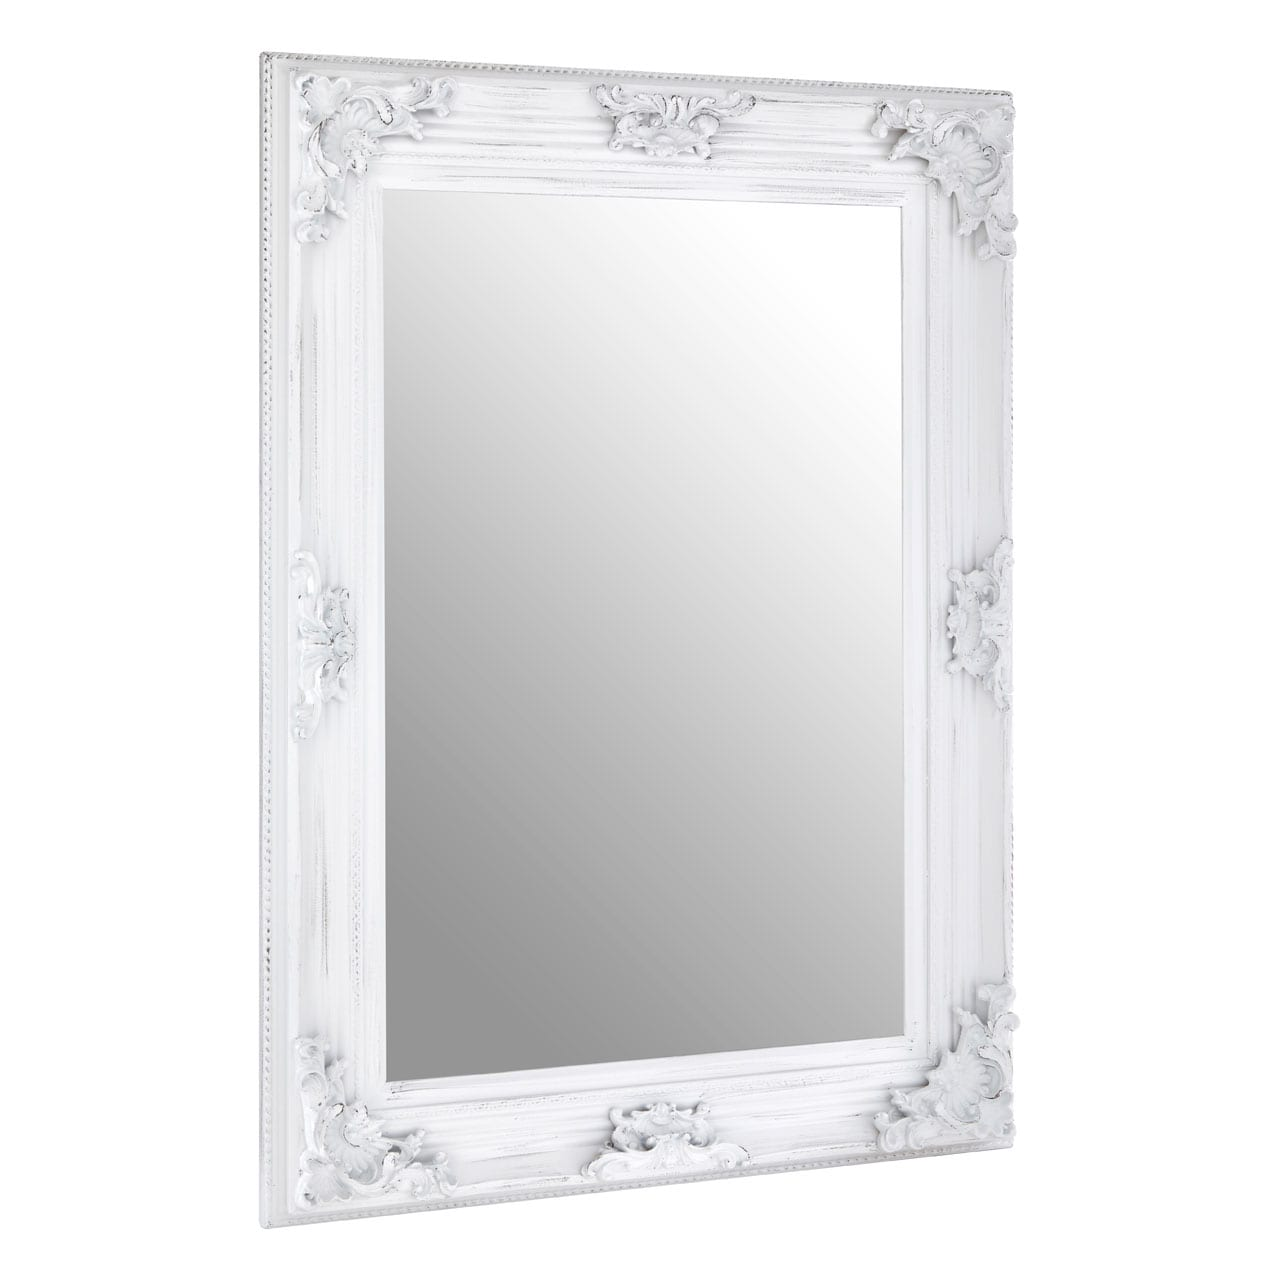 Cantata Antique White Wall Mirror